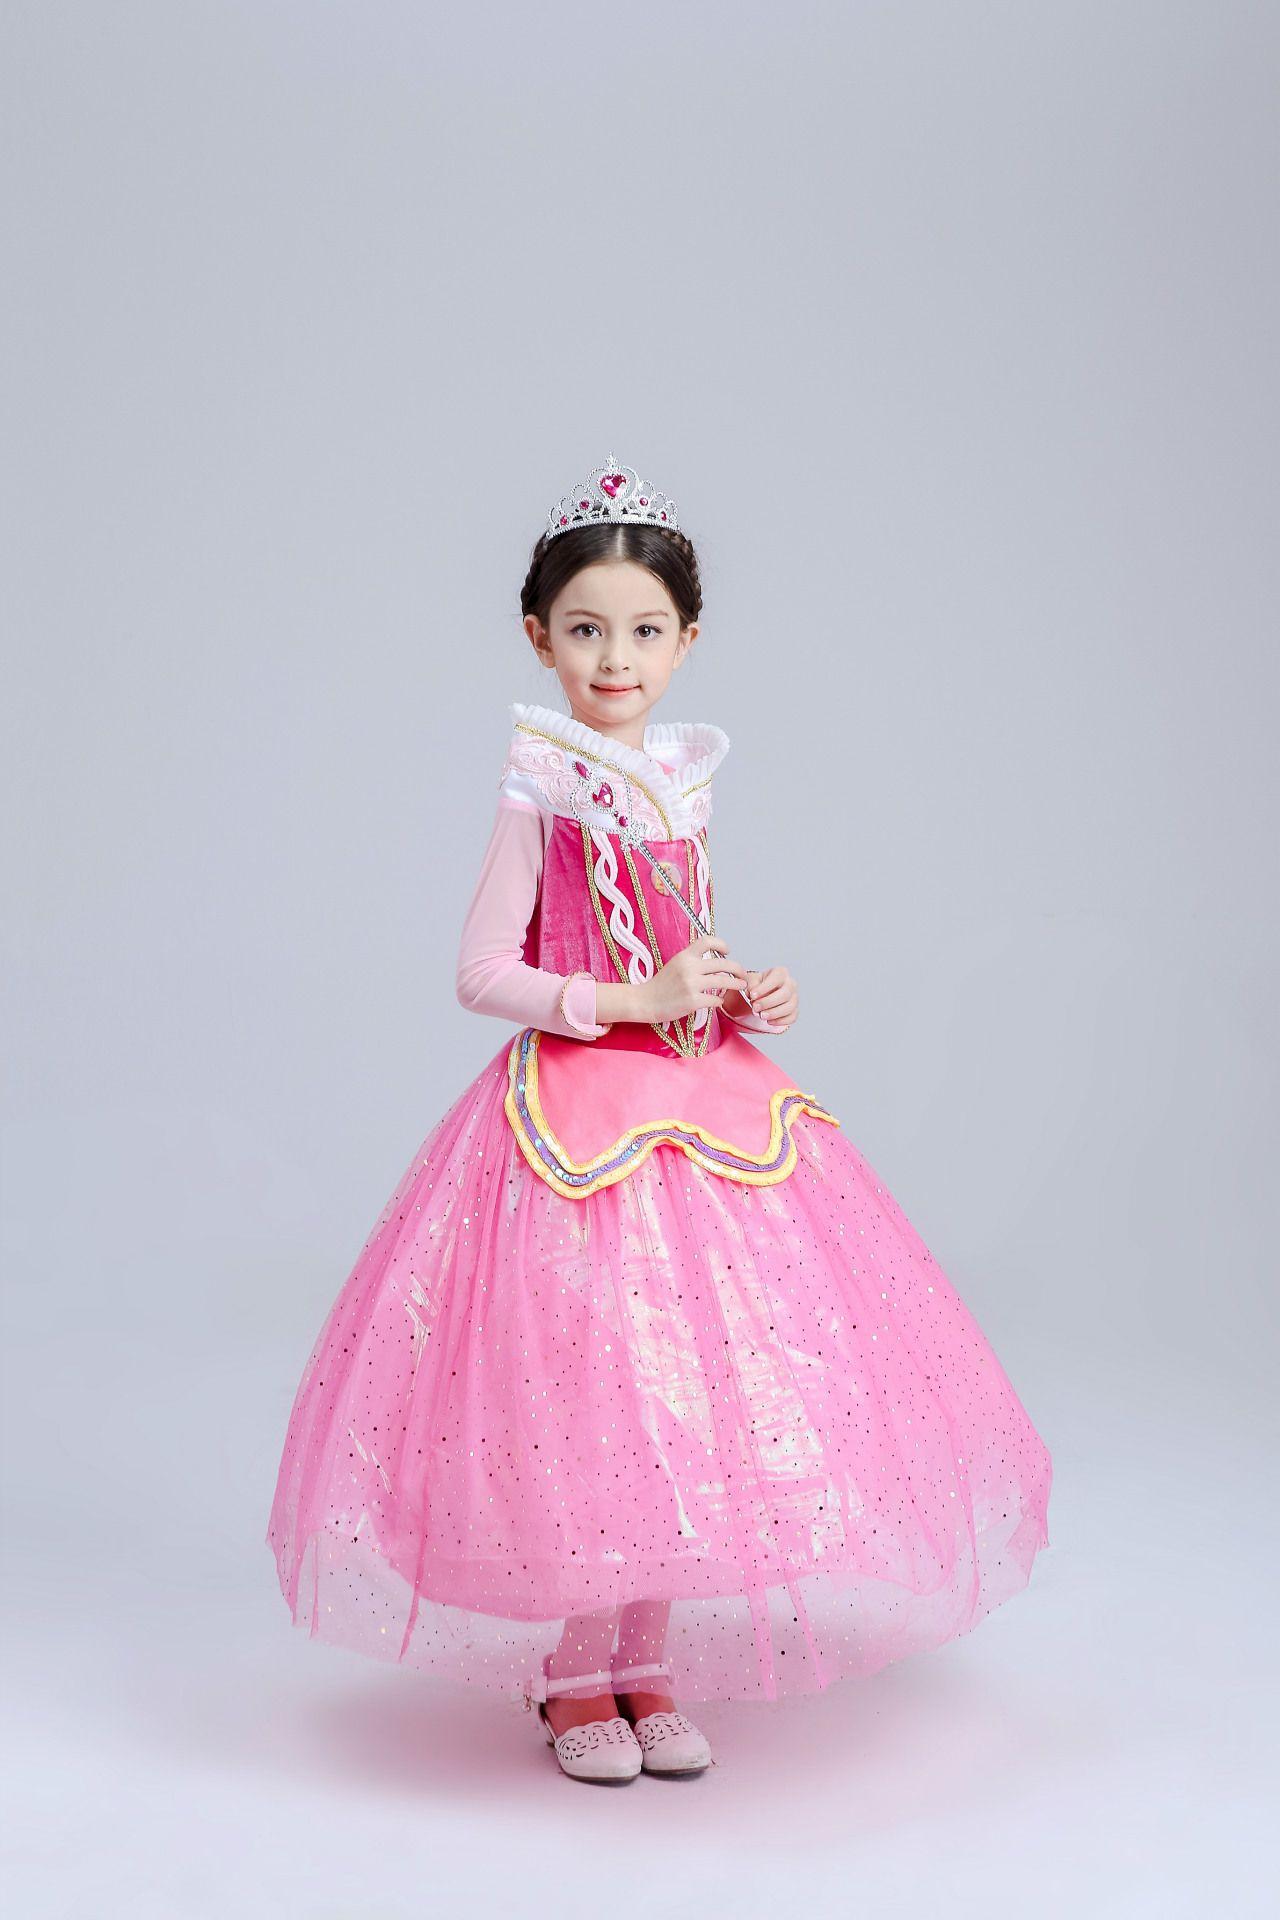 Best Belle Fancy Princess Dress Girl Children Clothing Dress